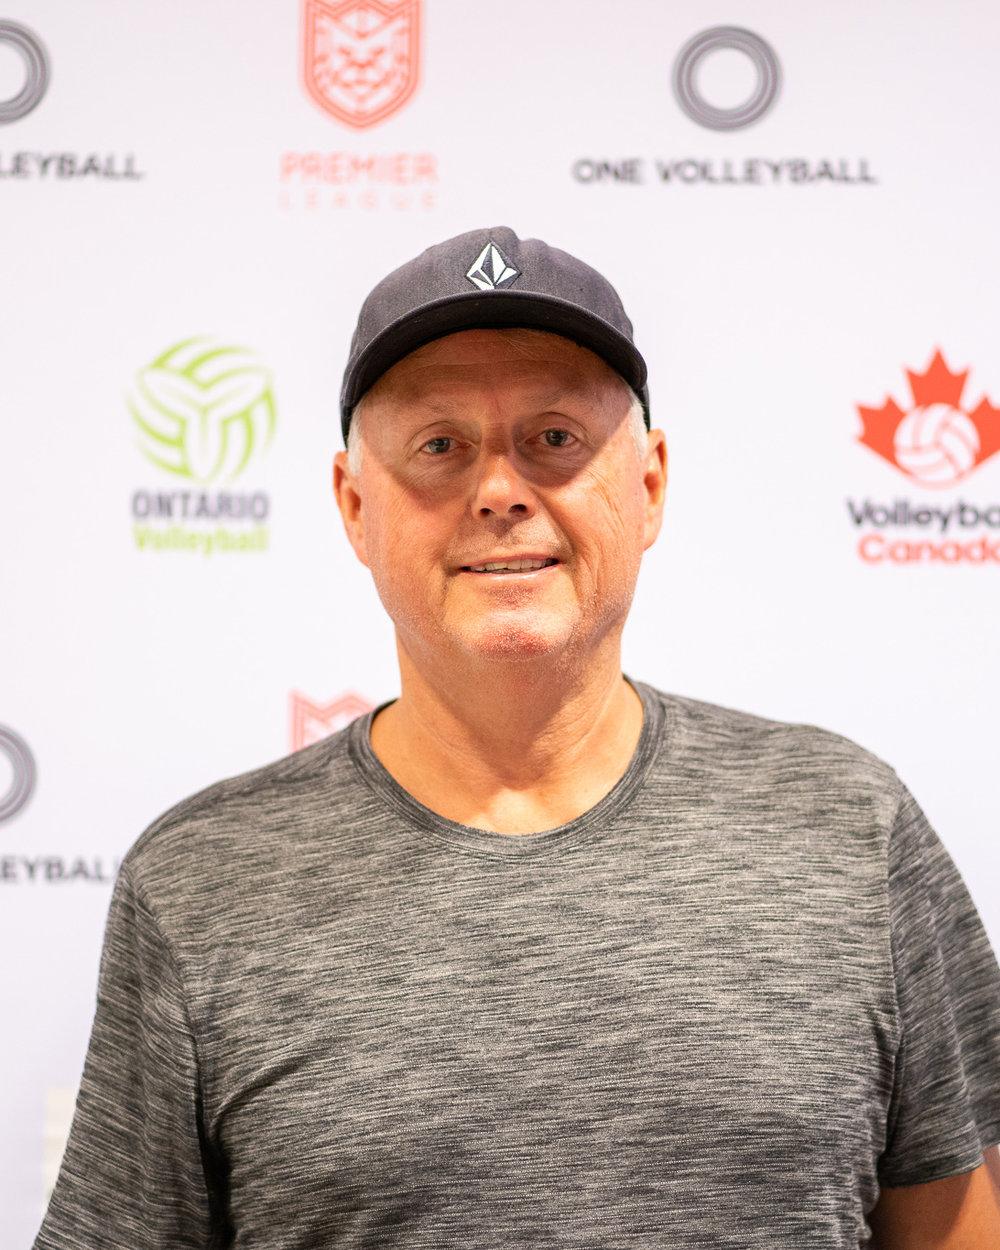 Owner & Head Coach - John May